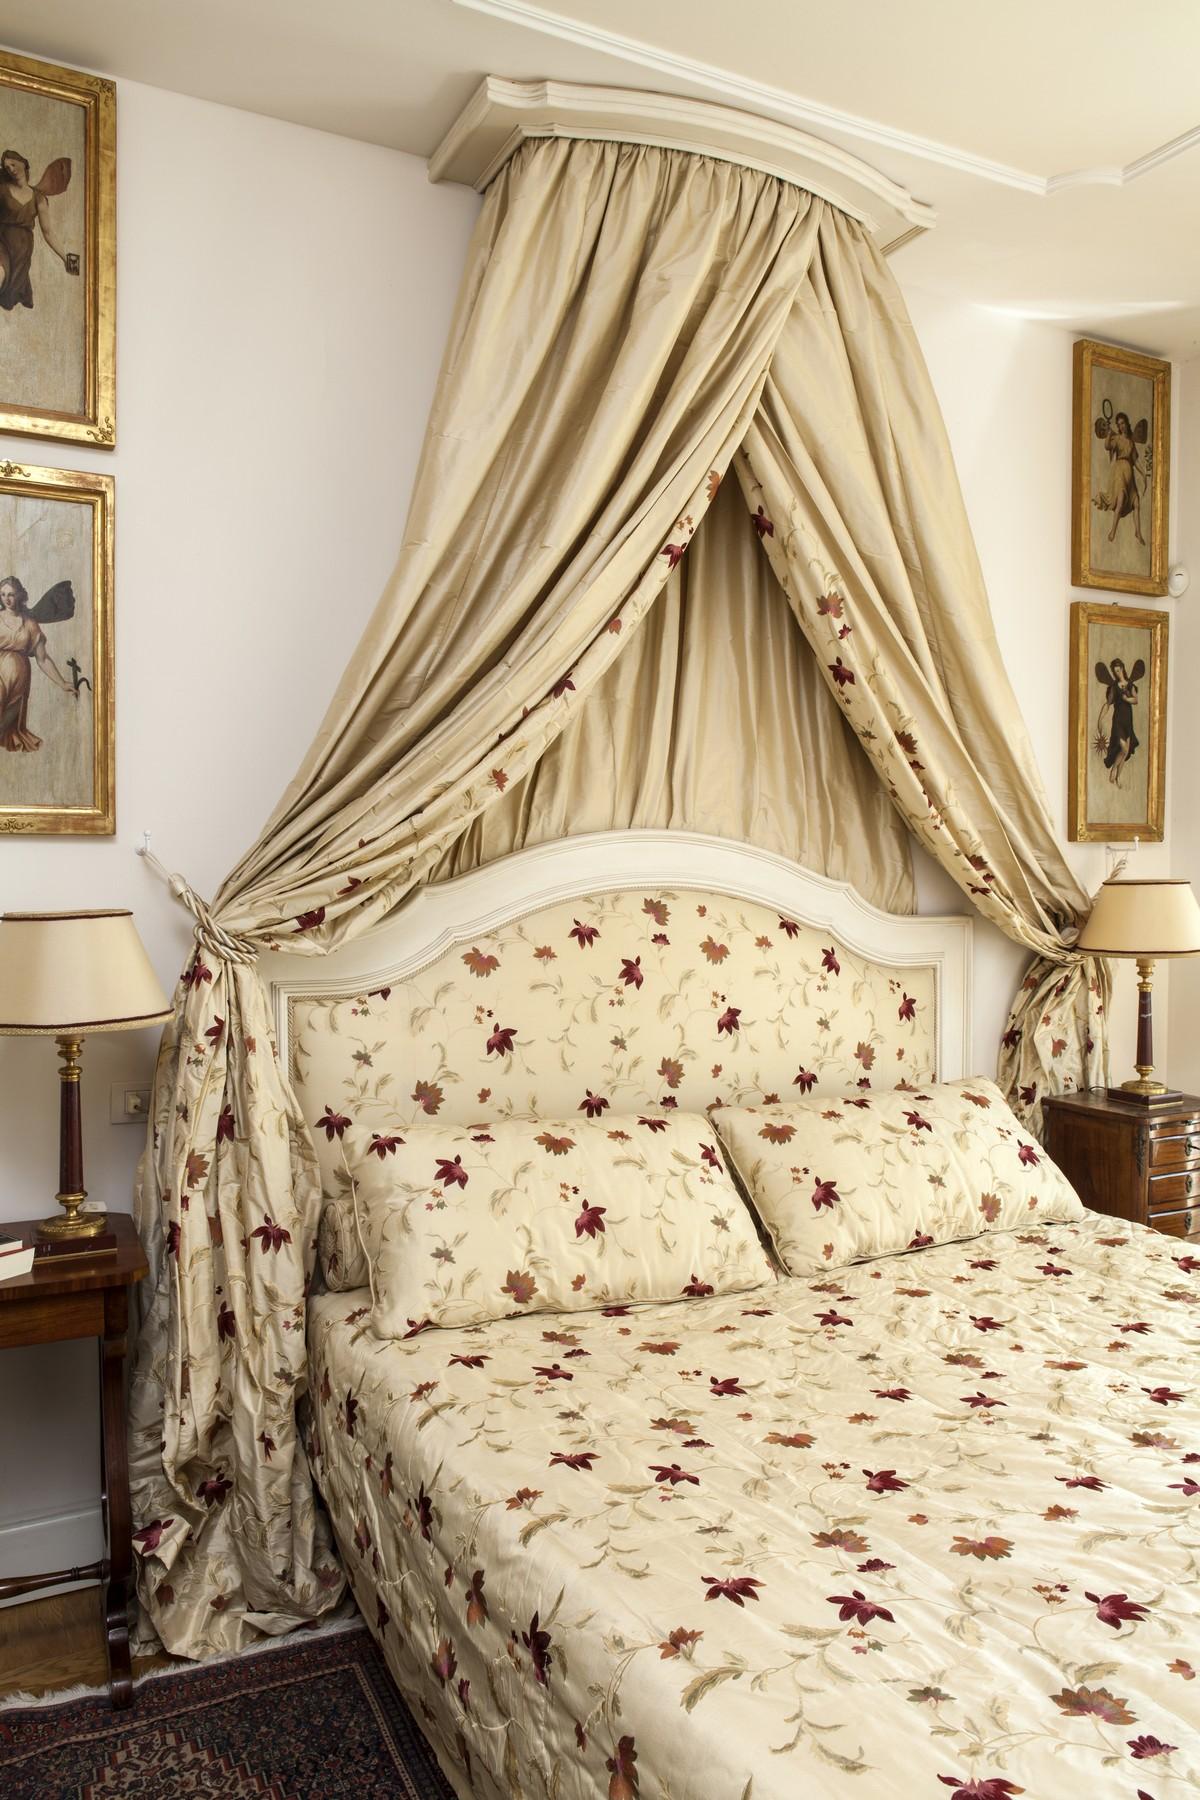 Additional photo for property listing at Wonderful apartment set in the luxurious villa Eros Via Cardano Como, Como 22100 Italia